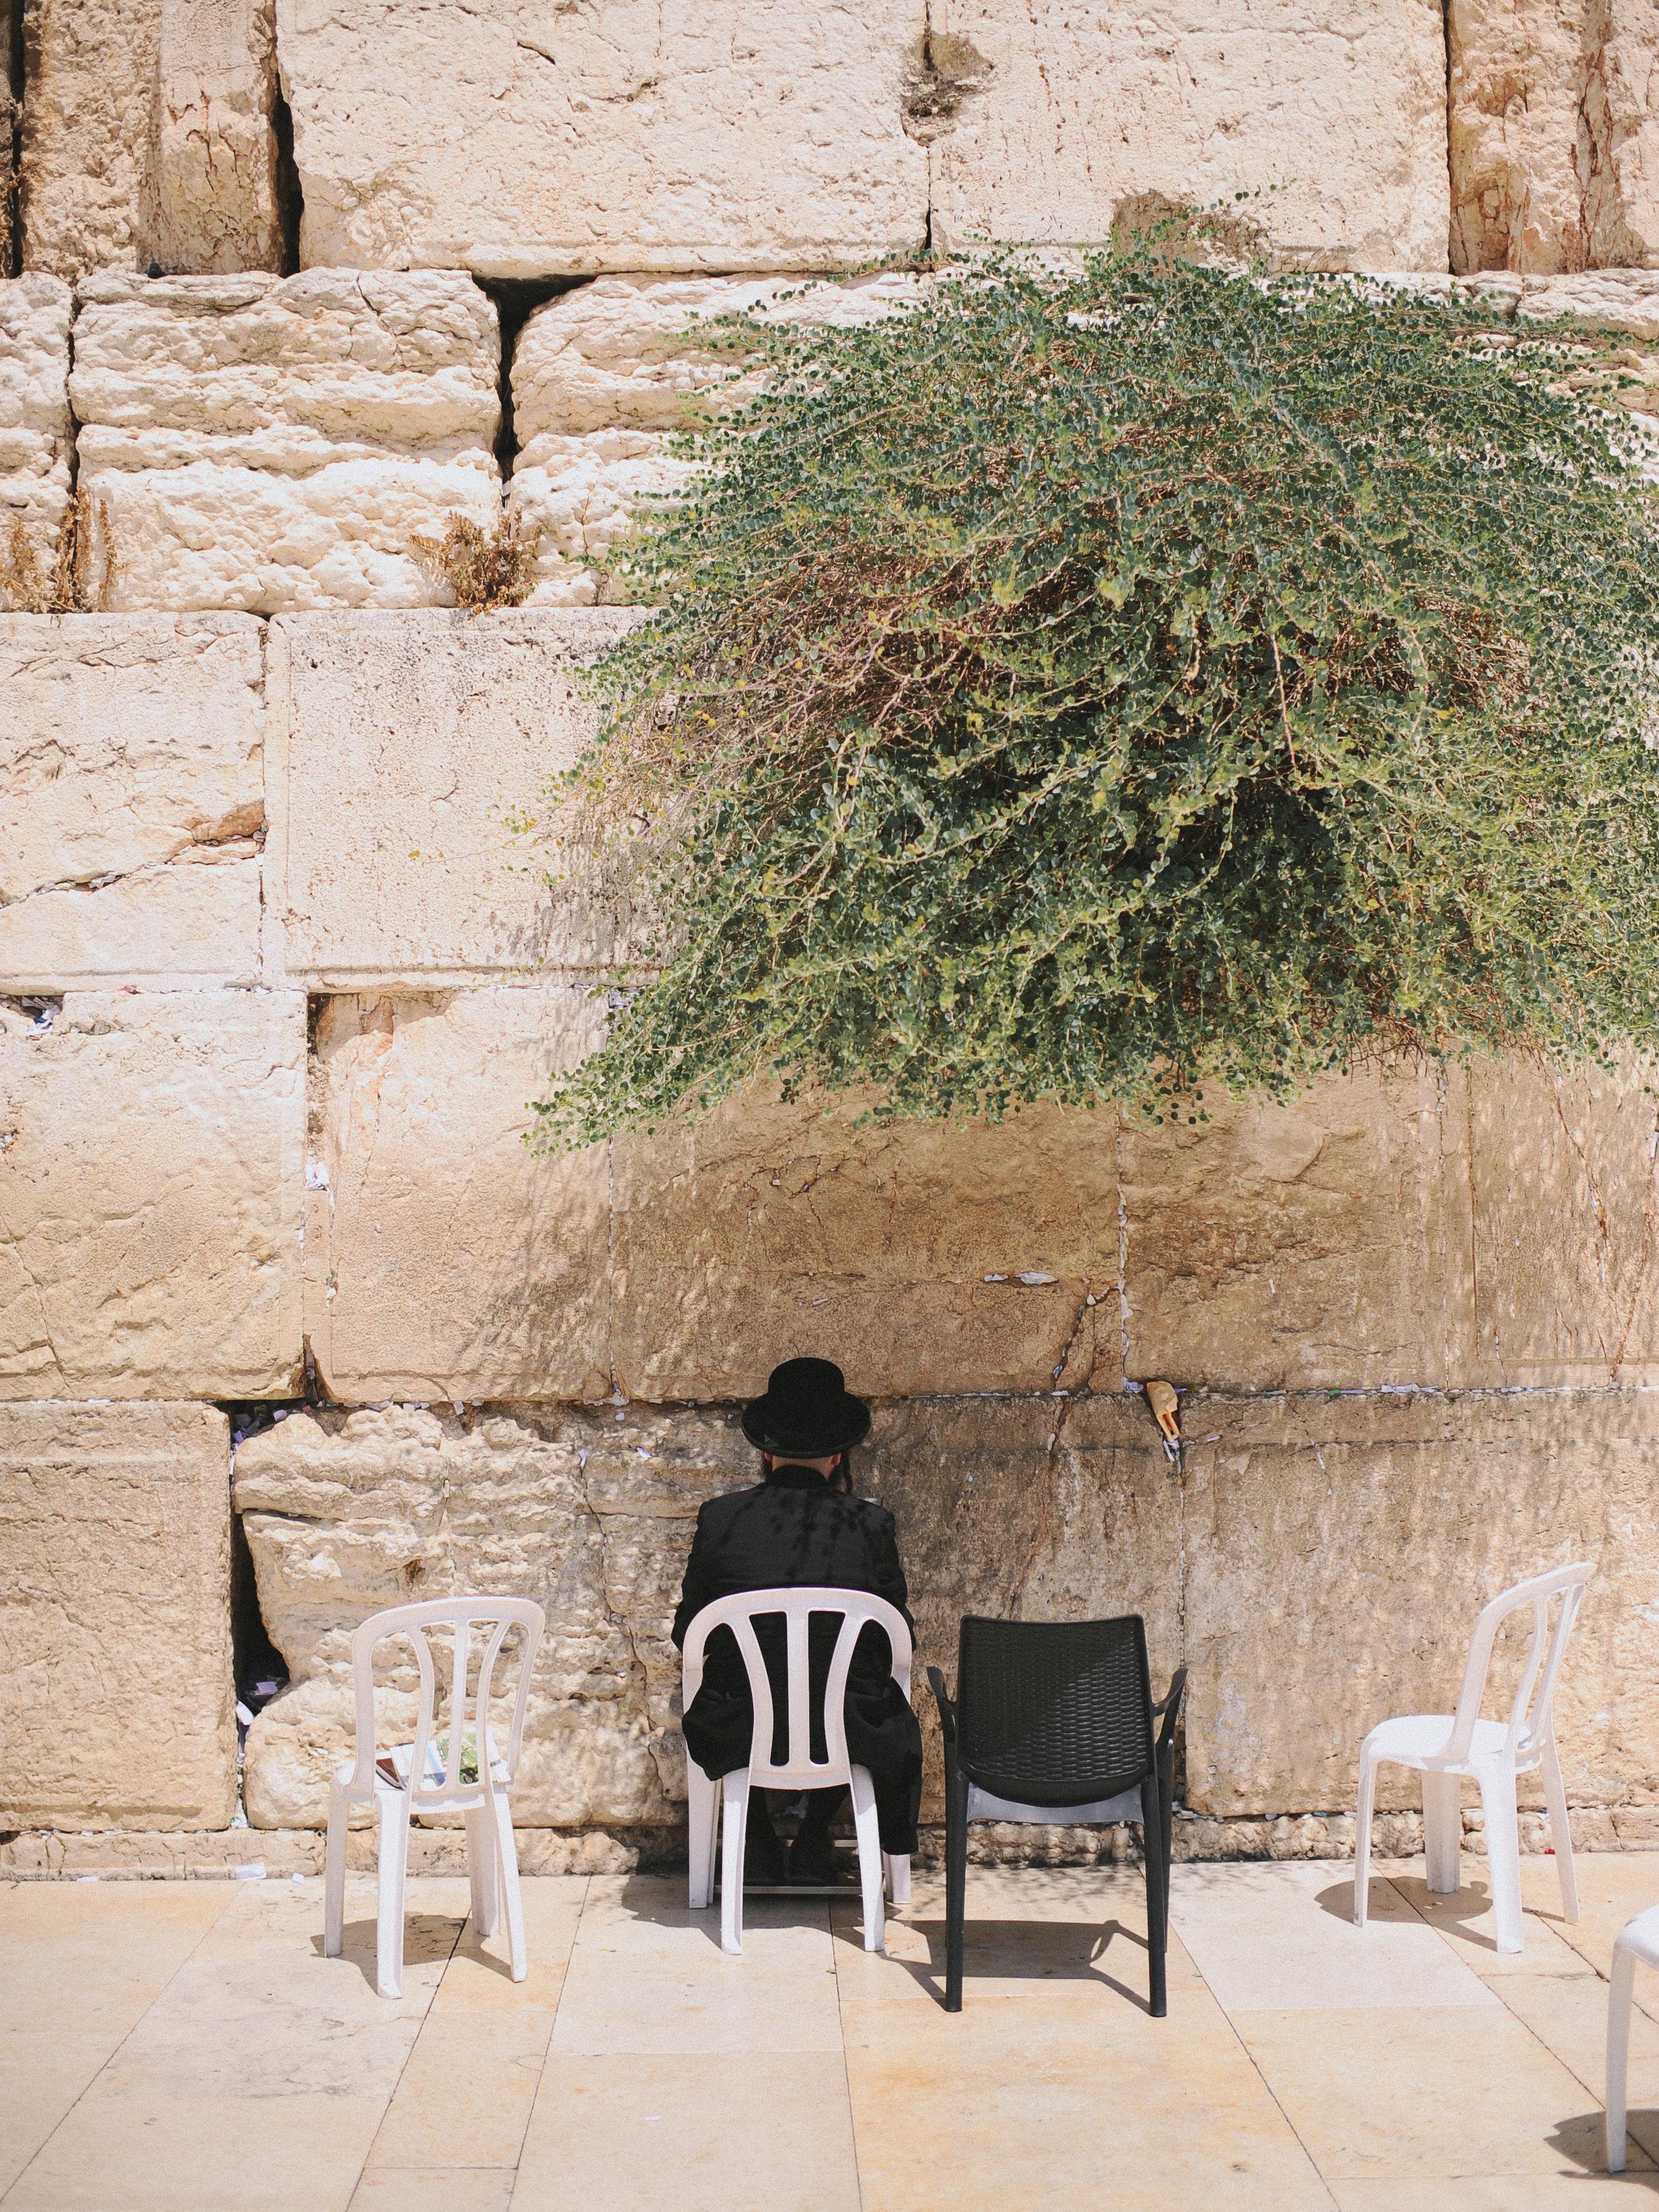 20170811_JERUSALEM_01_164-Edit.jpg